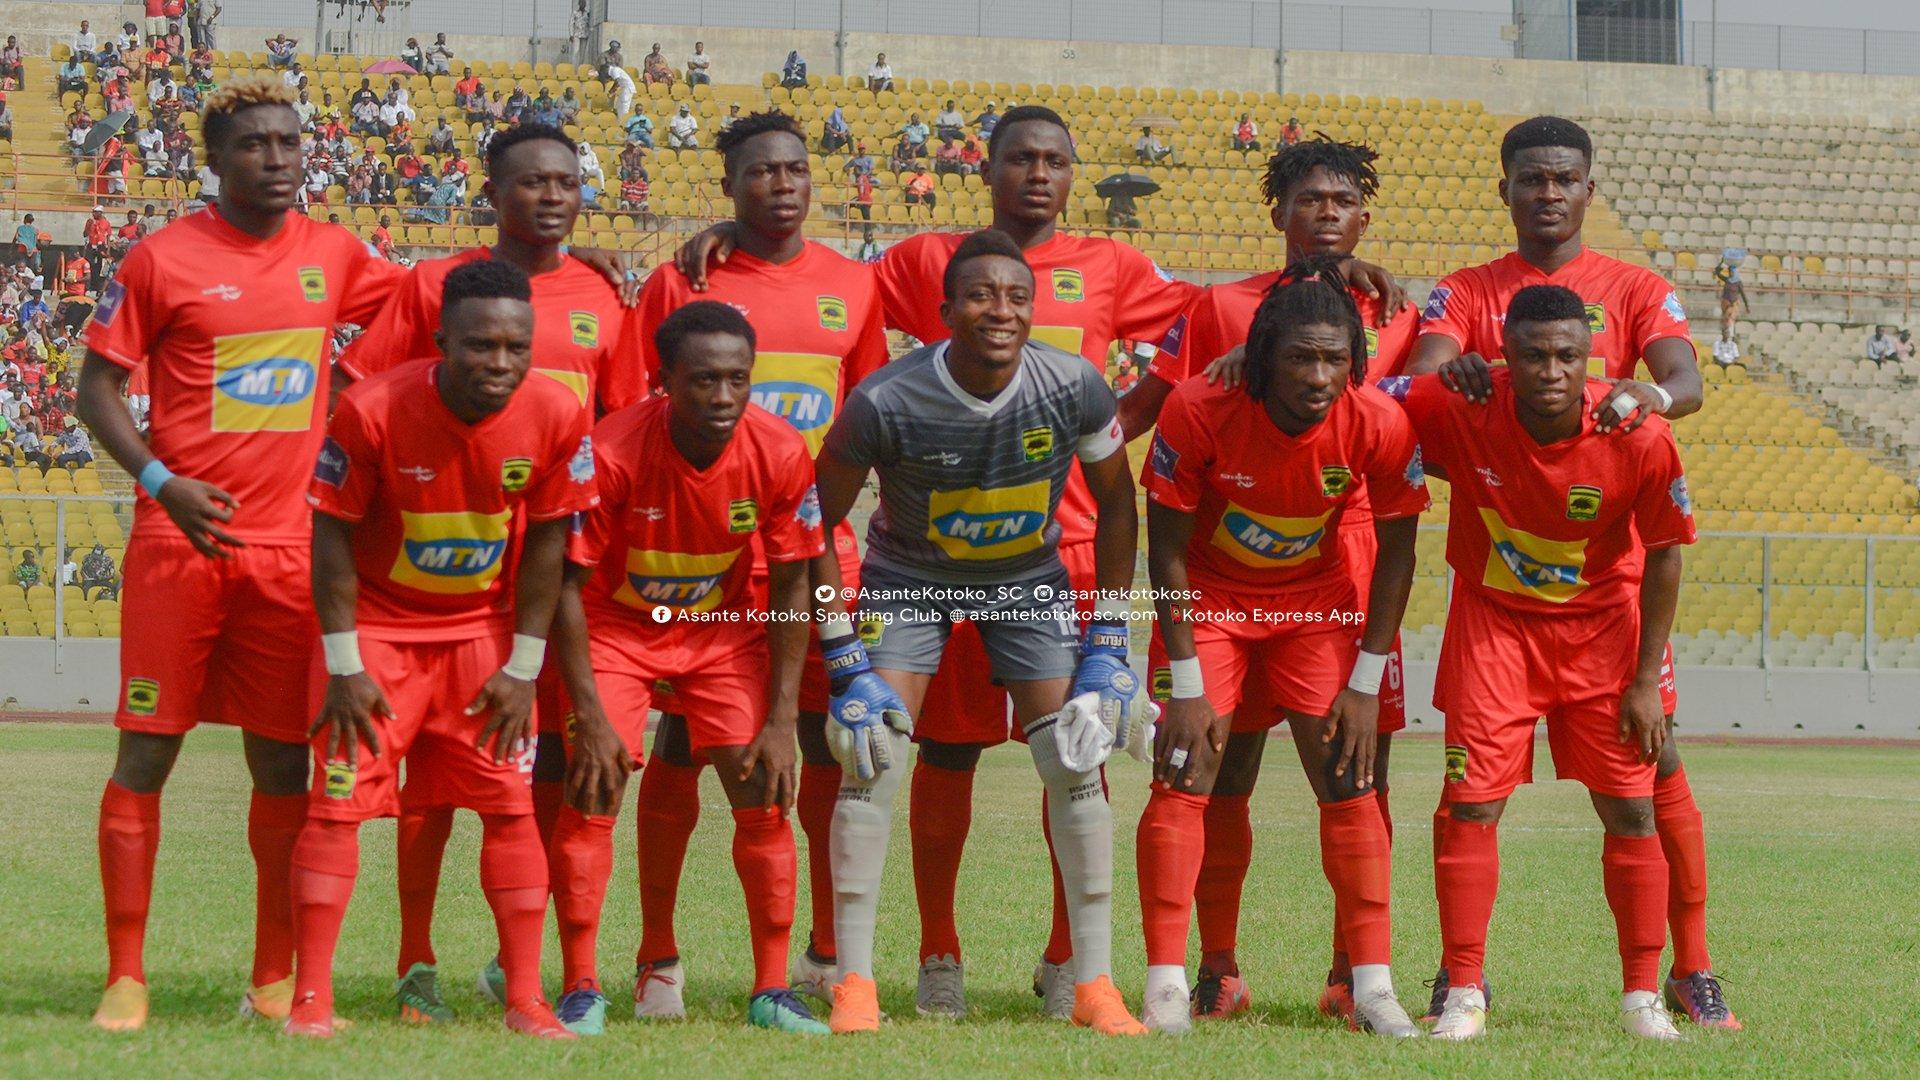 Asante Kotoko set to fly out of Ghana for pre-season